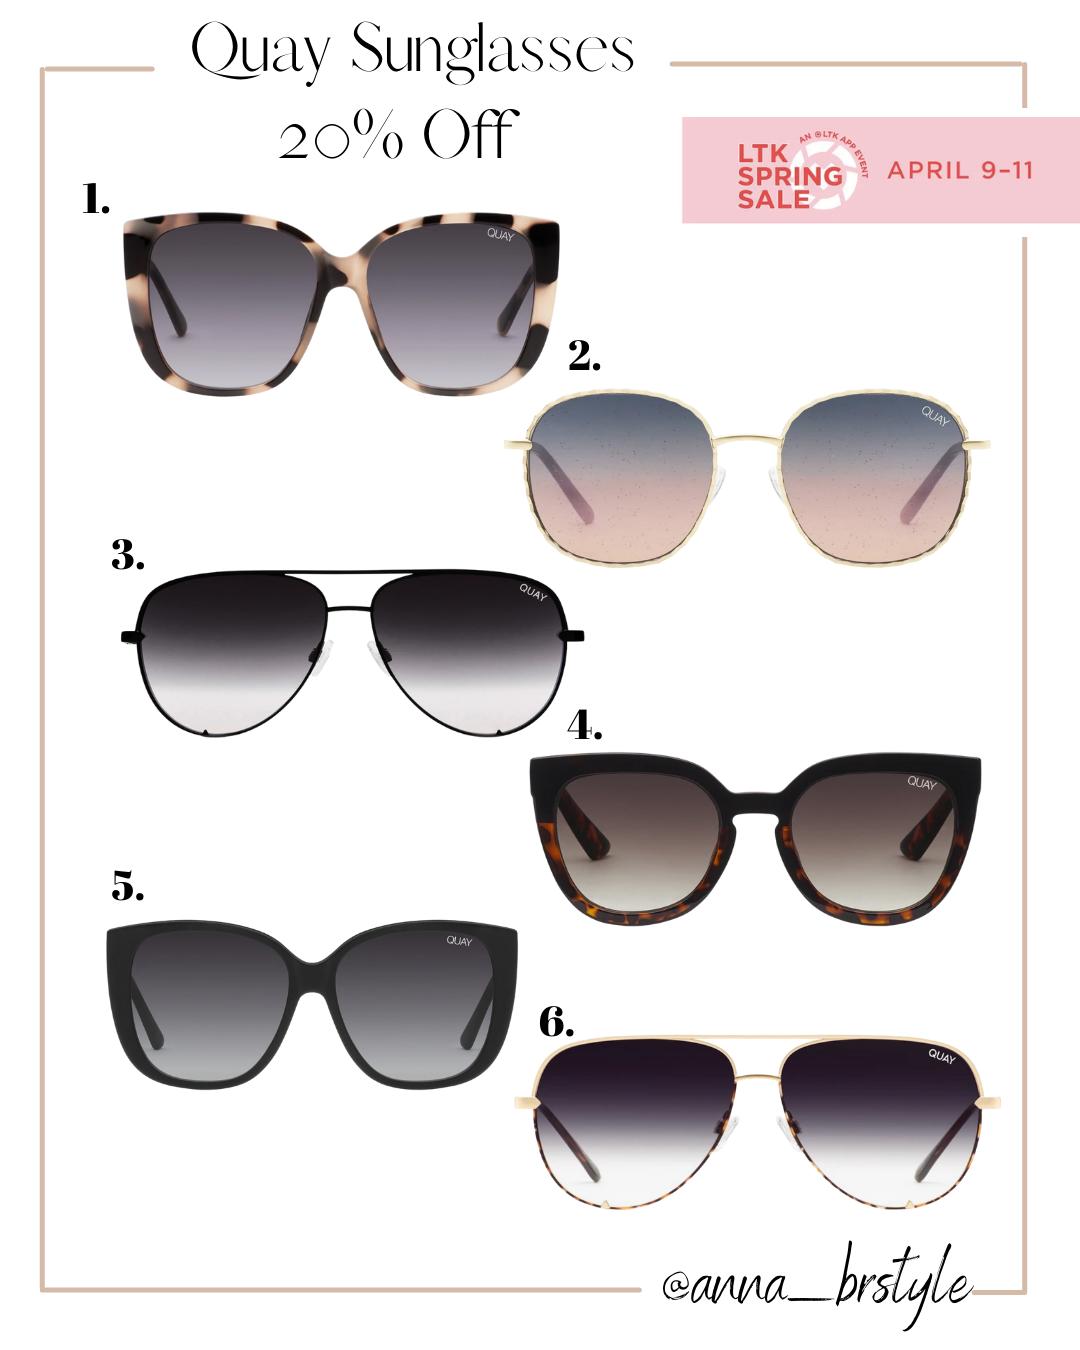 quay sunglasses on sale